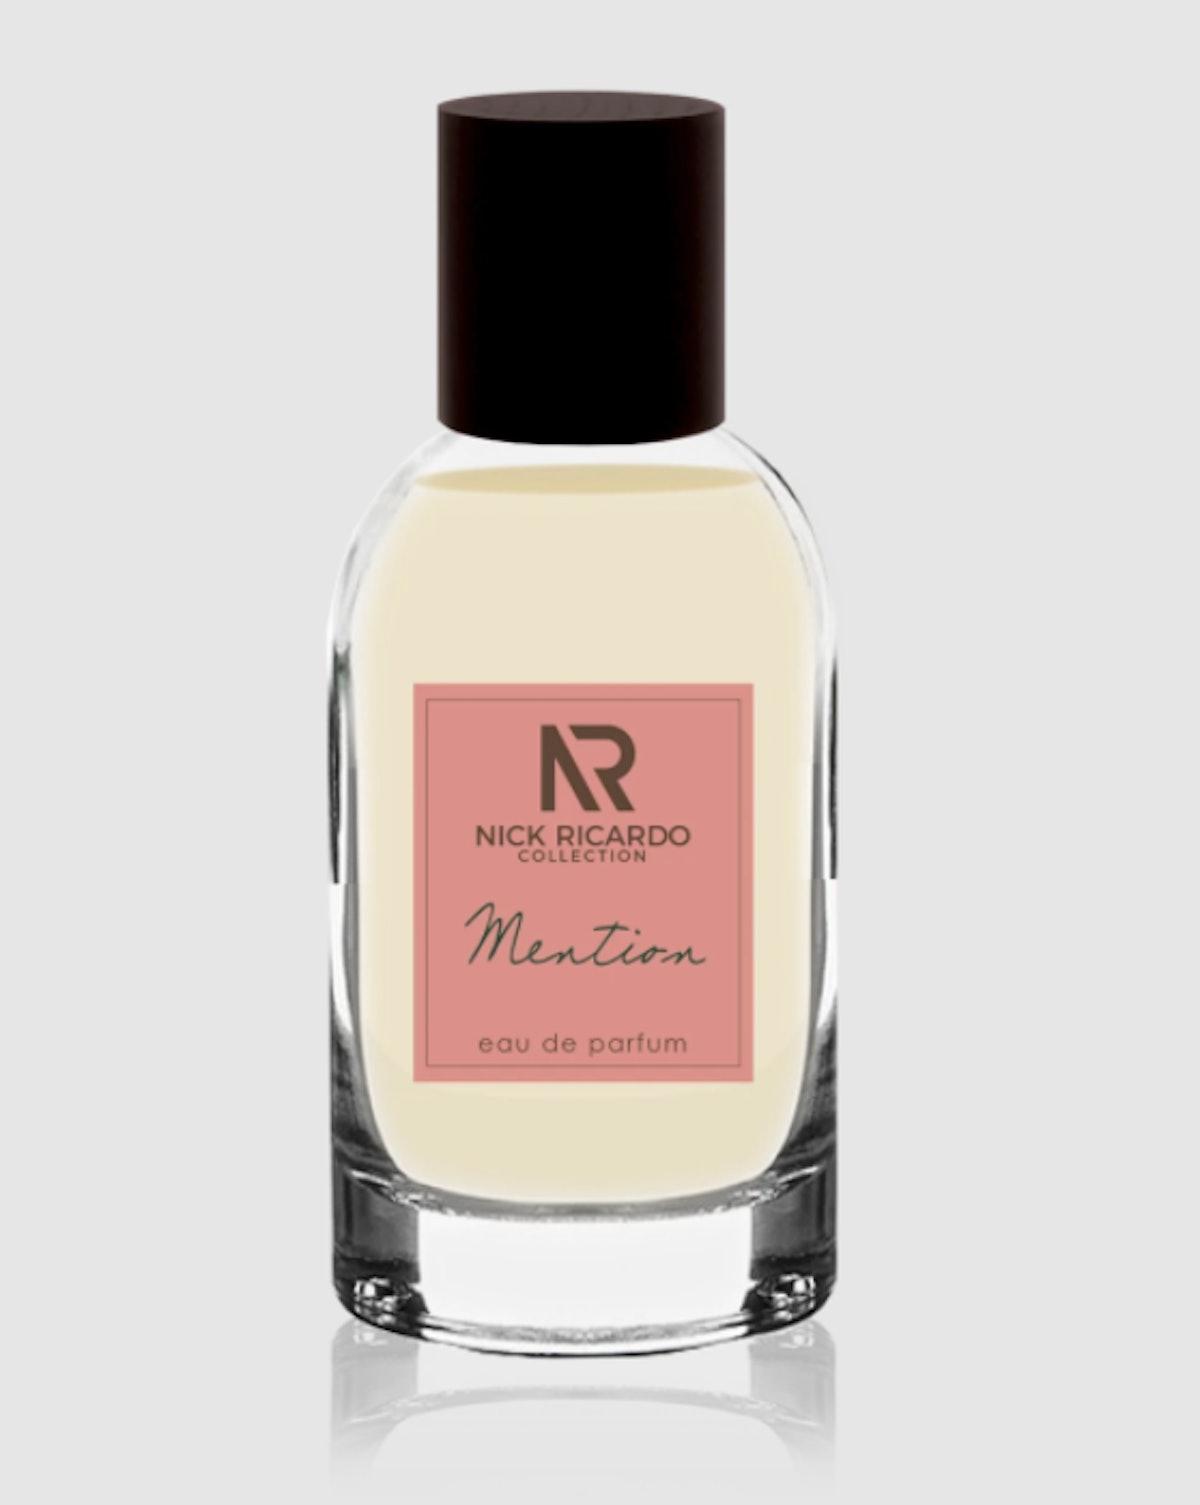 Mention Fragrance